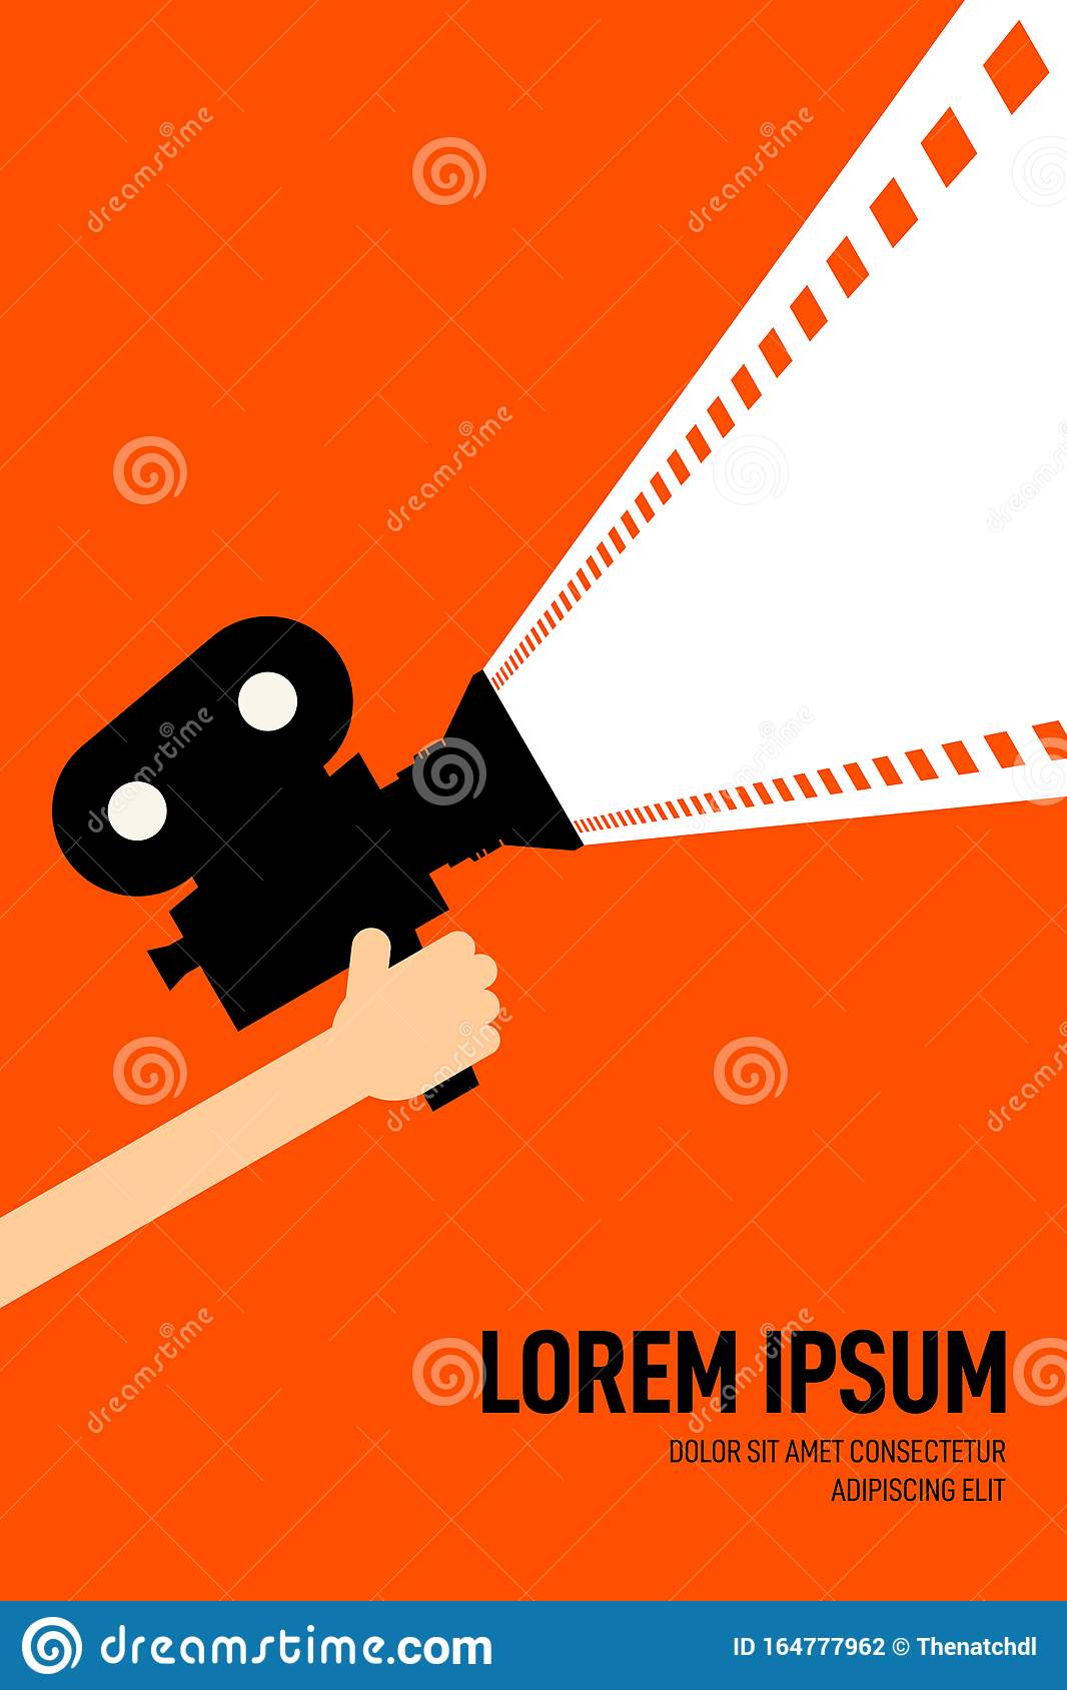 Movie And Film Poster Design Template Background Vintage Retro Style Stock Illustration Illustration Of Illustration Banner 164777962